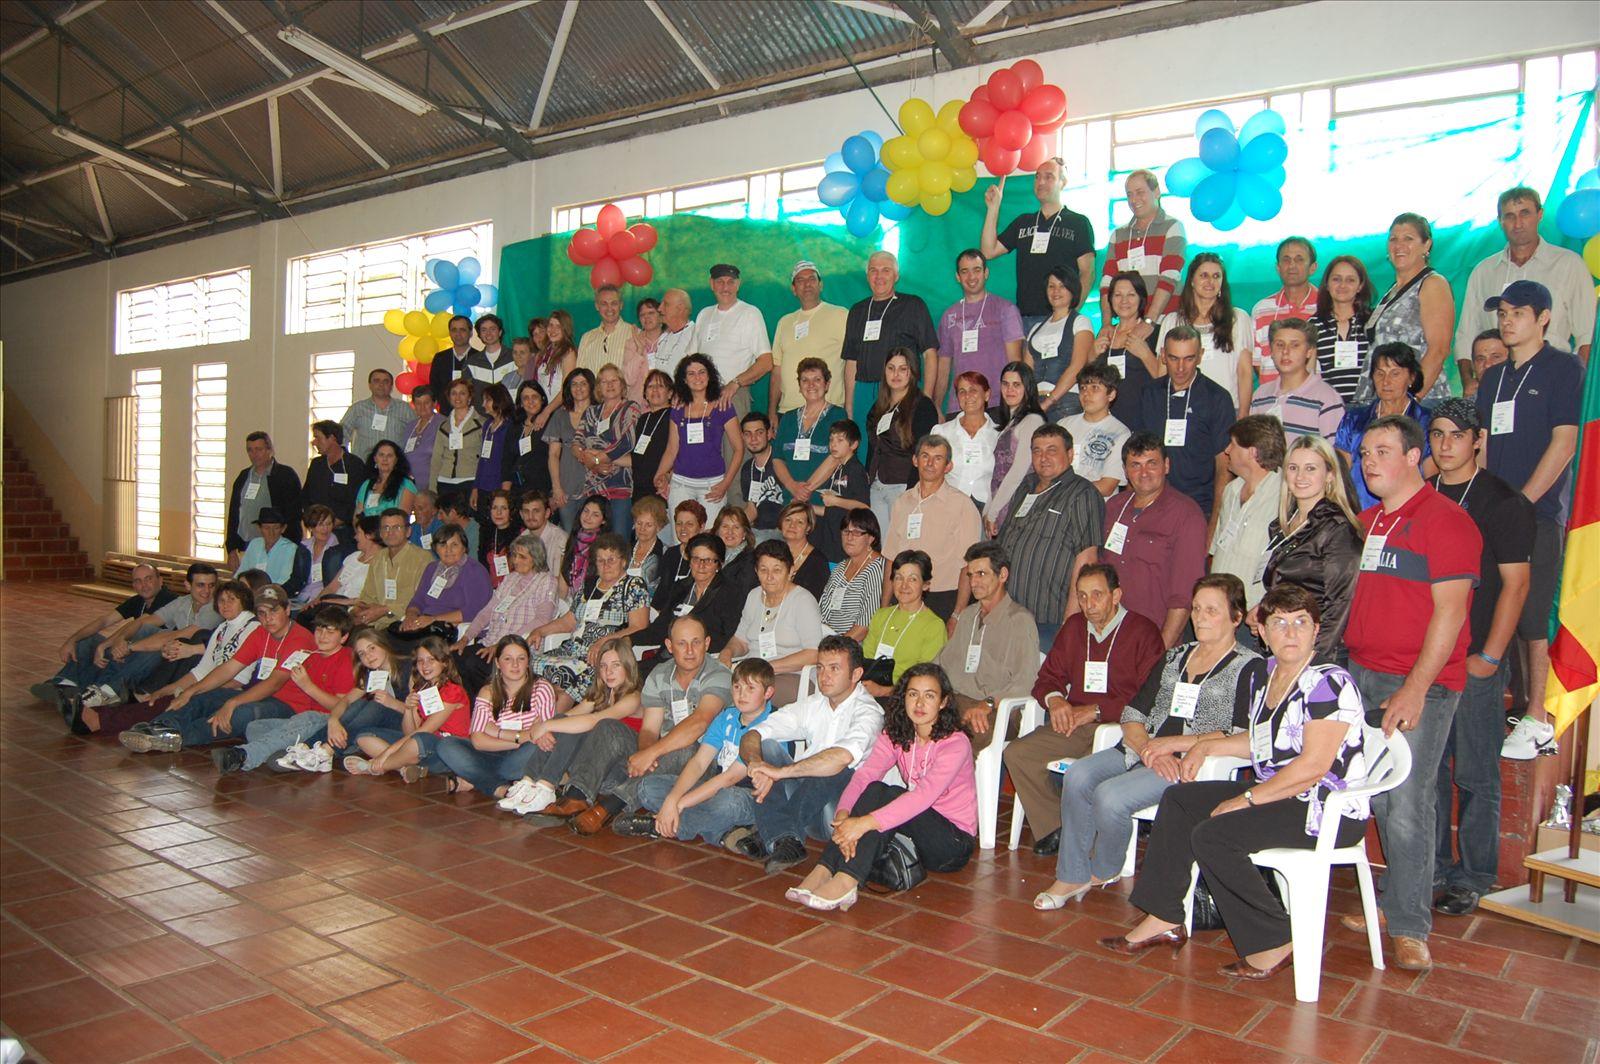 2º Encontro Família Cornelli - 11.10.2009 (171)_0